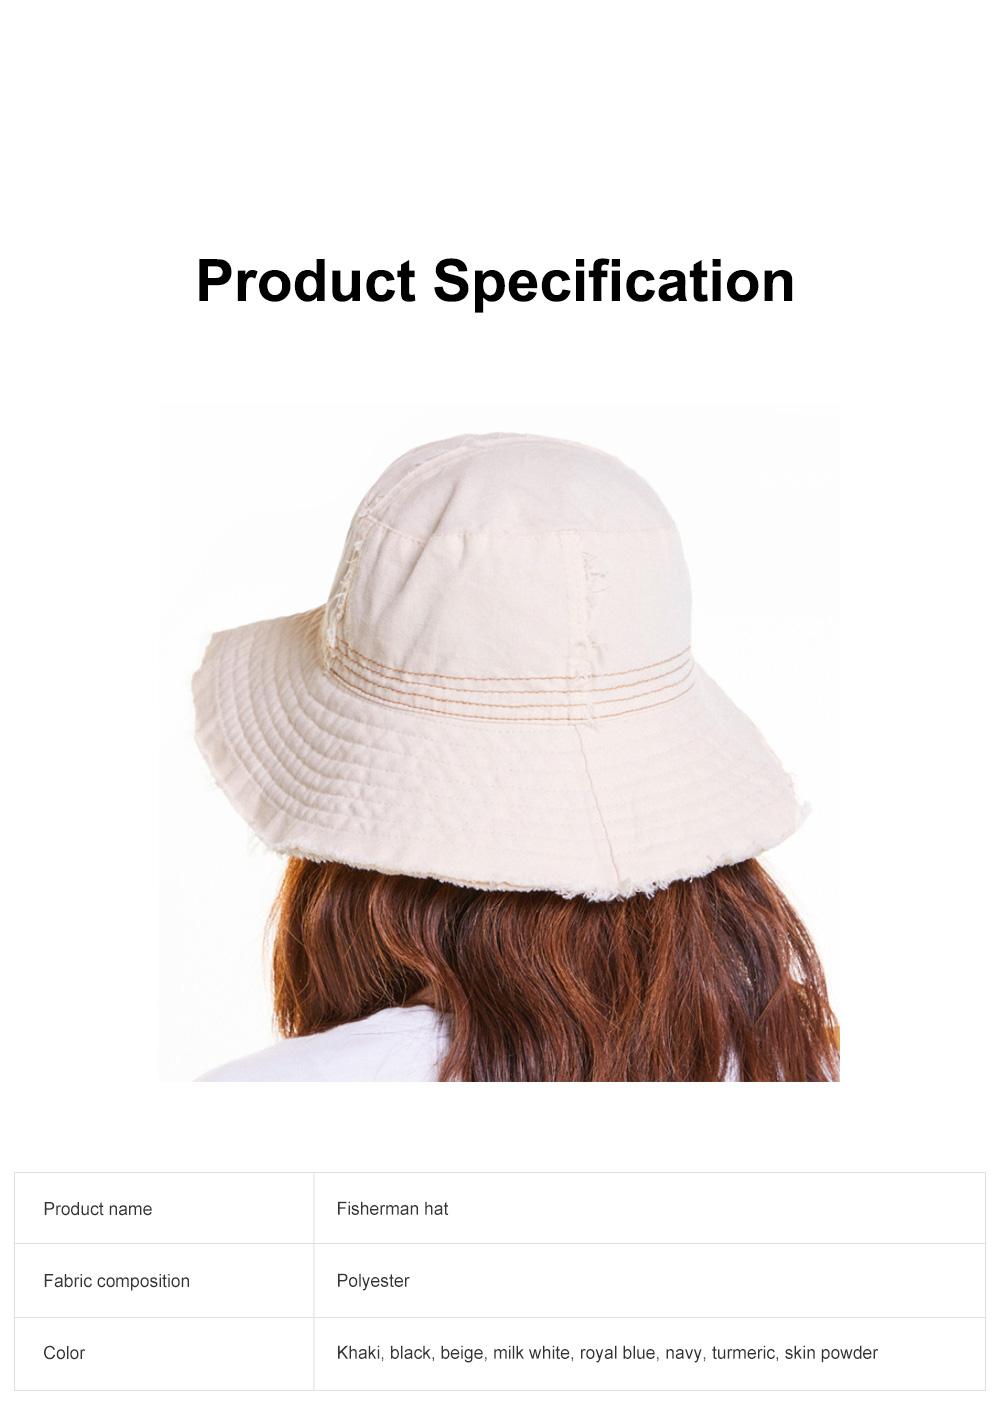 Japanese Hairline Cowboy Fisherman Hat Female Autumn Winter Sun Hat Personality Wild Hat Cap Folding Washable Cloth Cap 6